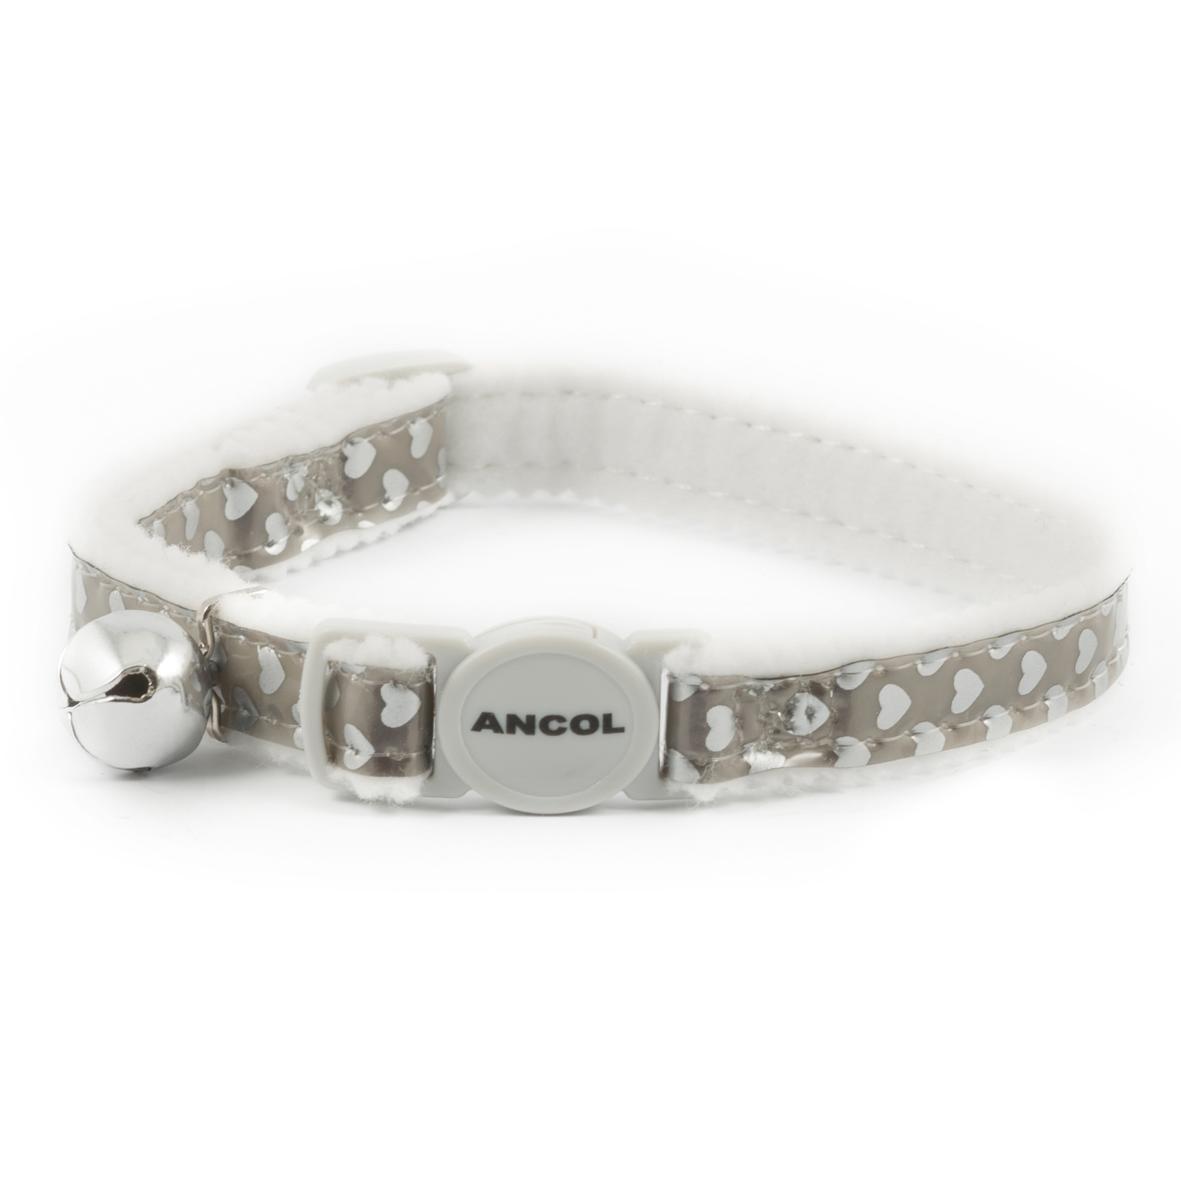 ANCOL Reflective Gloss Cat Collar Silver Hearts 20-30cm